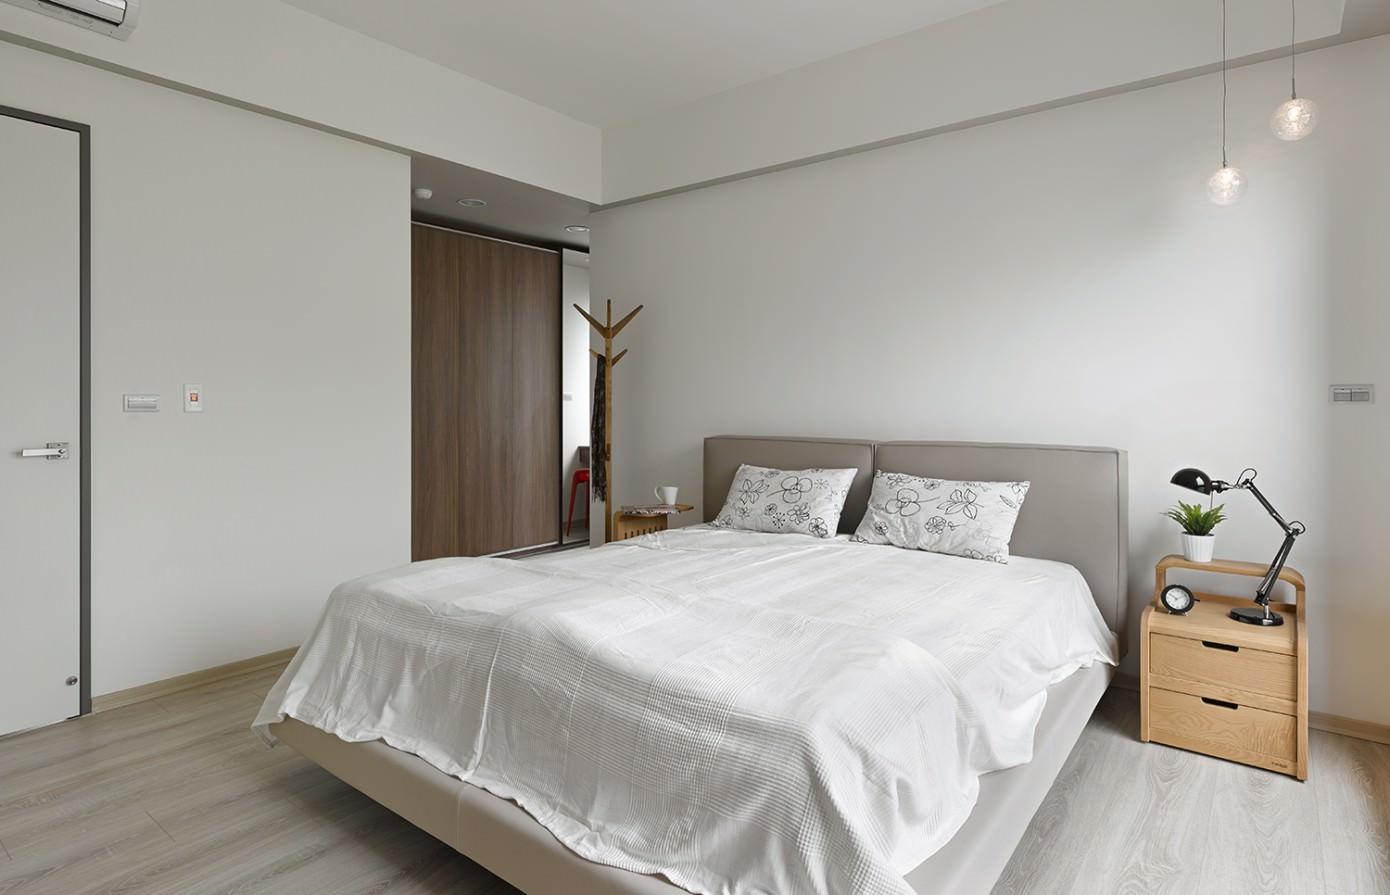 Liu's Warm House by HOYA design